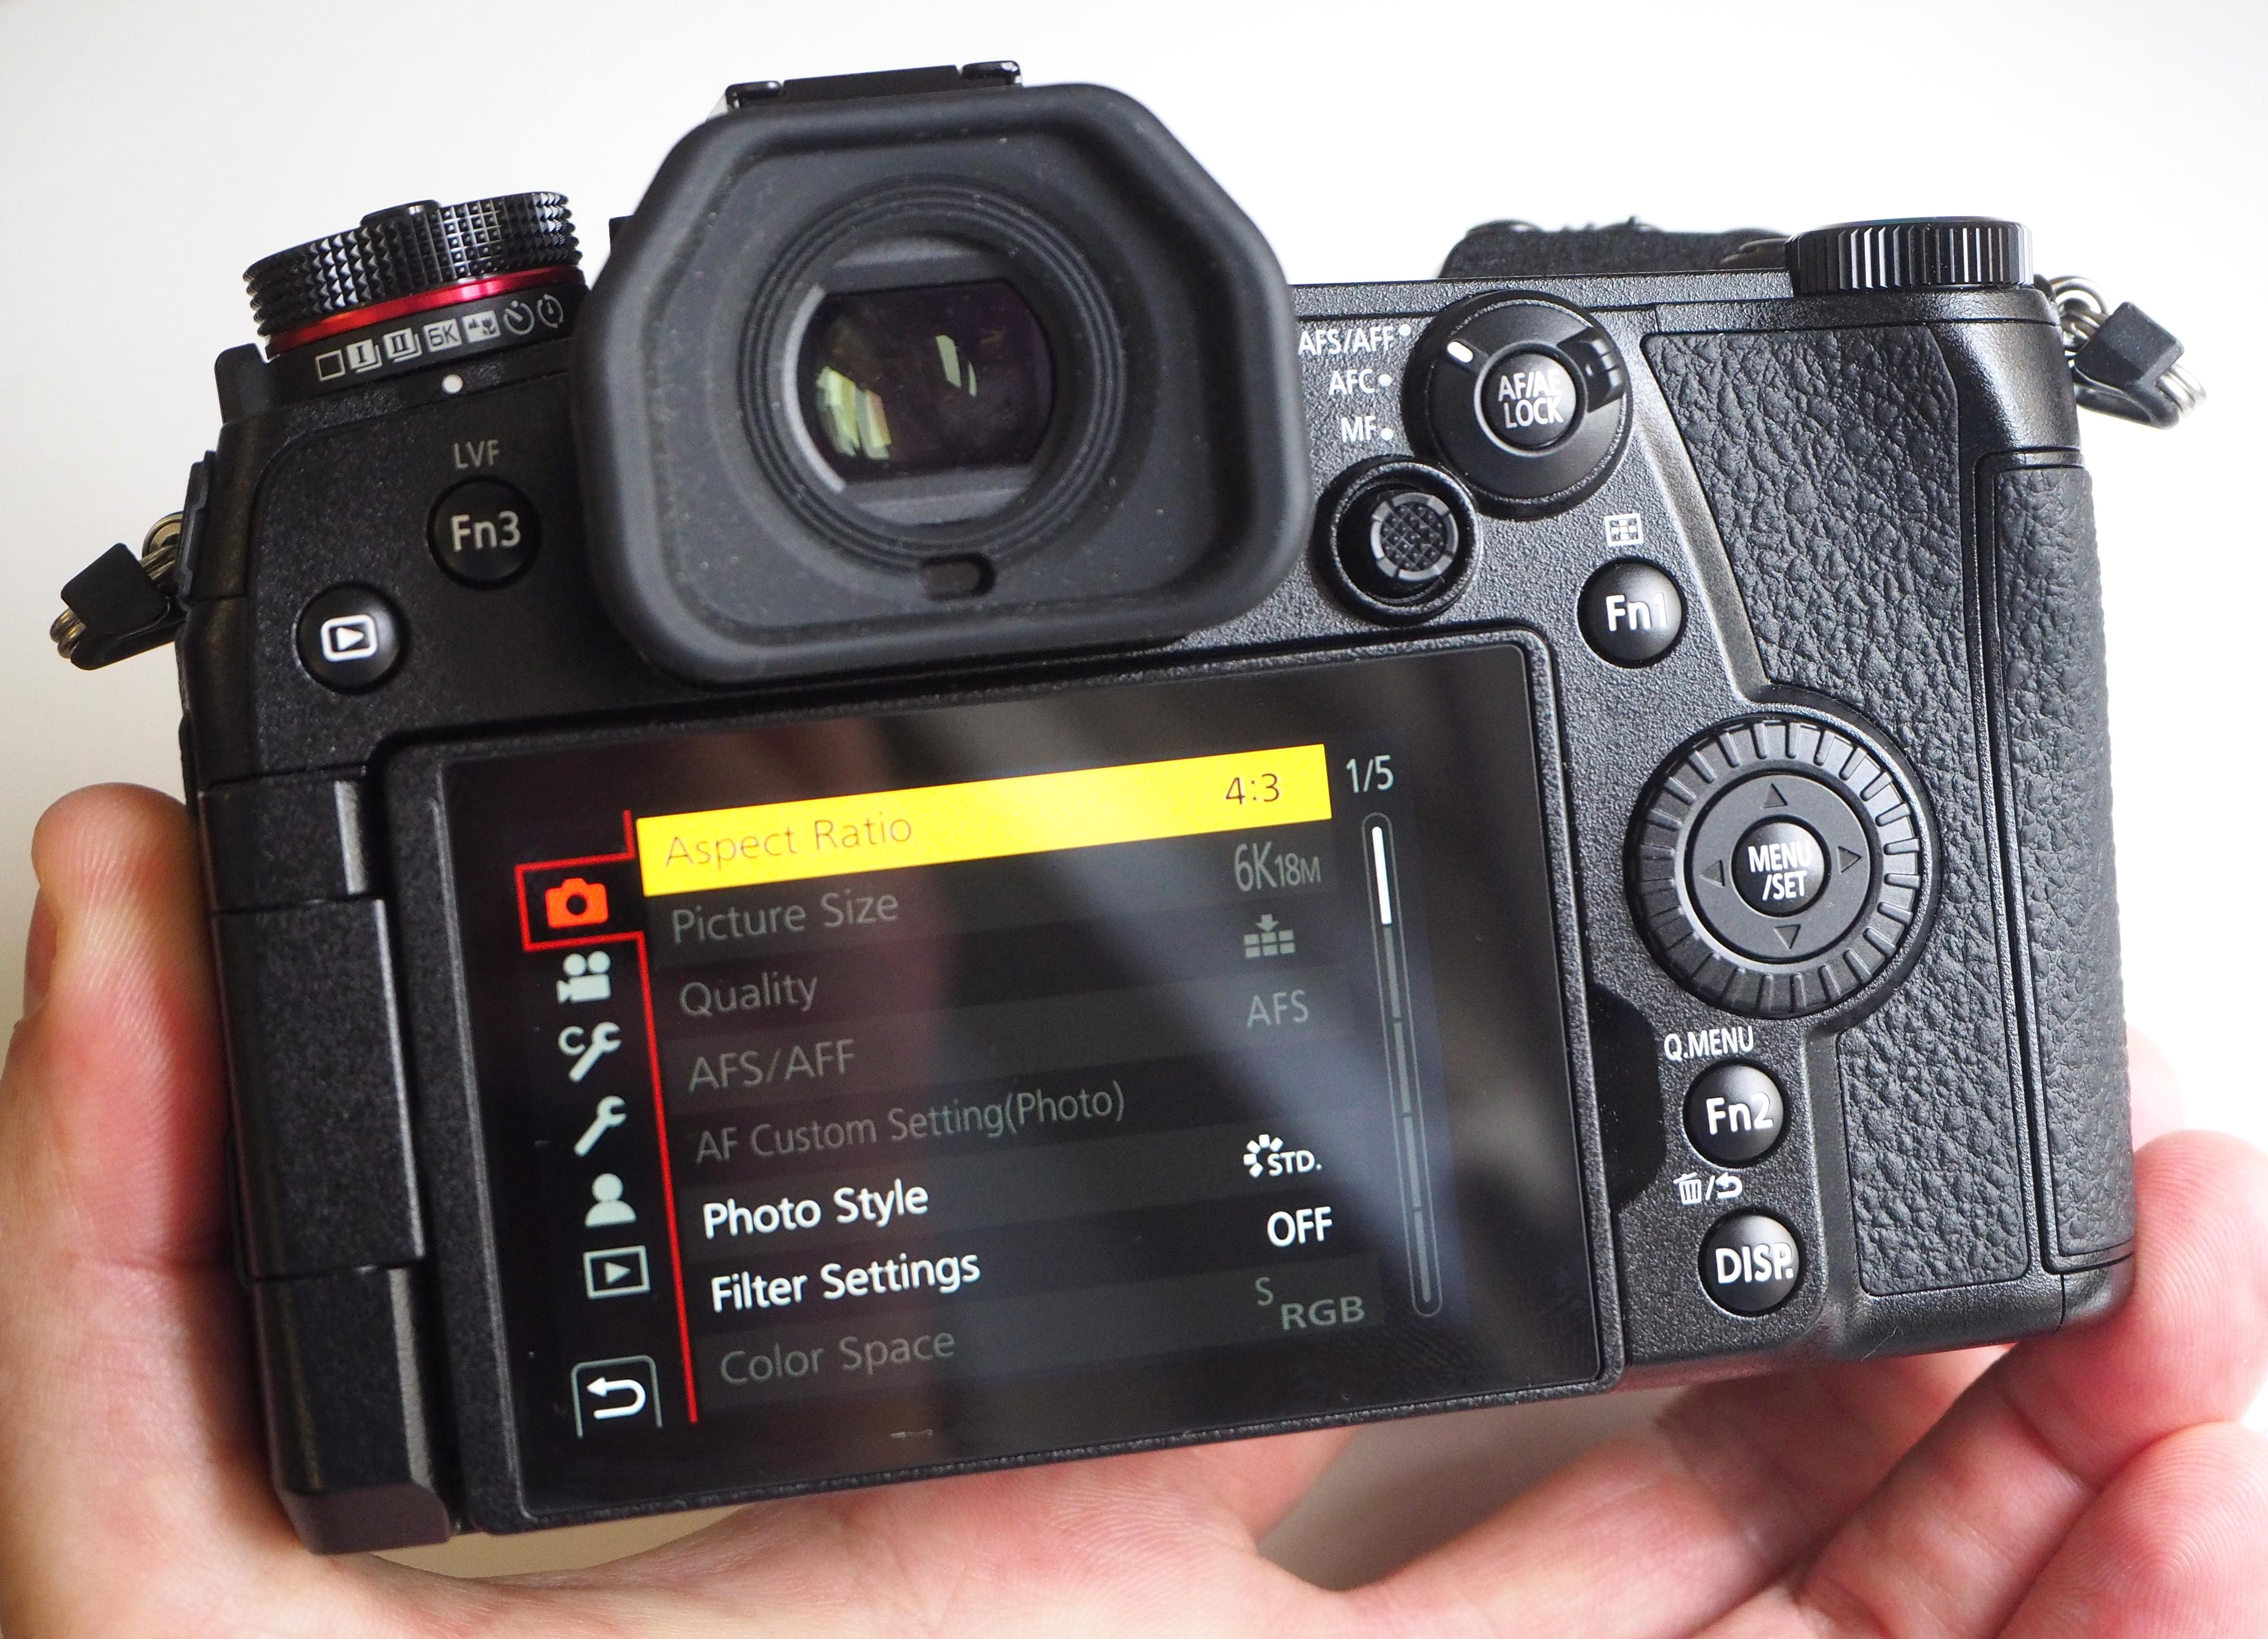 Panasonic Lumix G9 Expert Review | ePHOTOzine